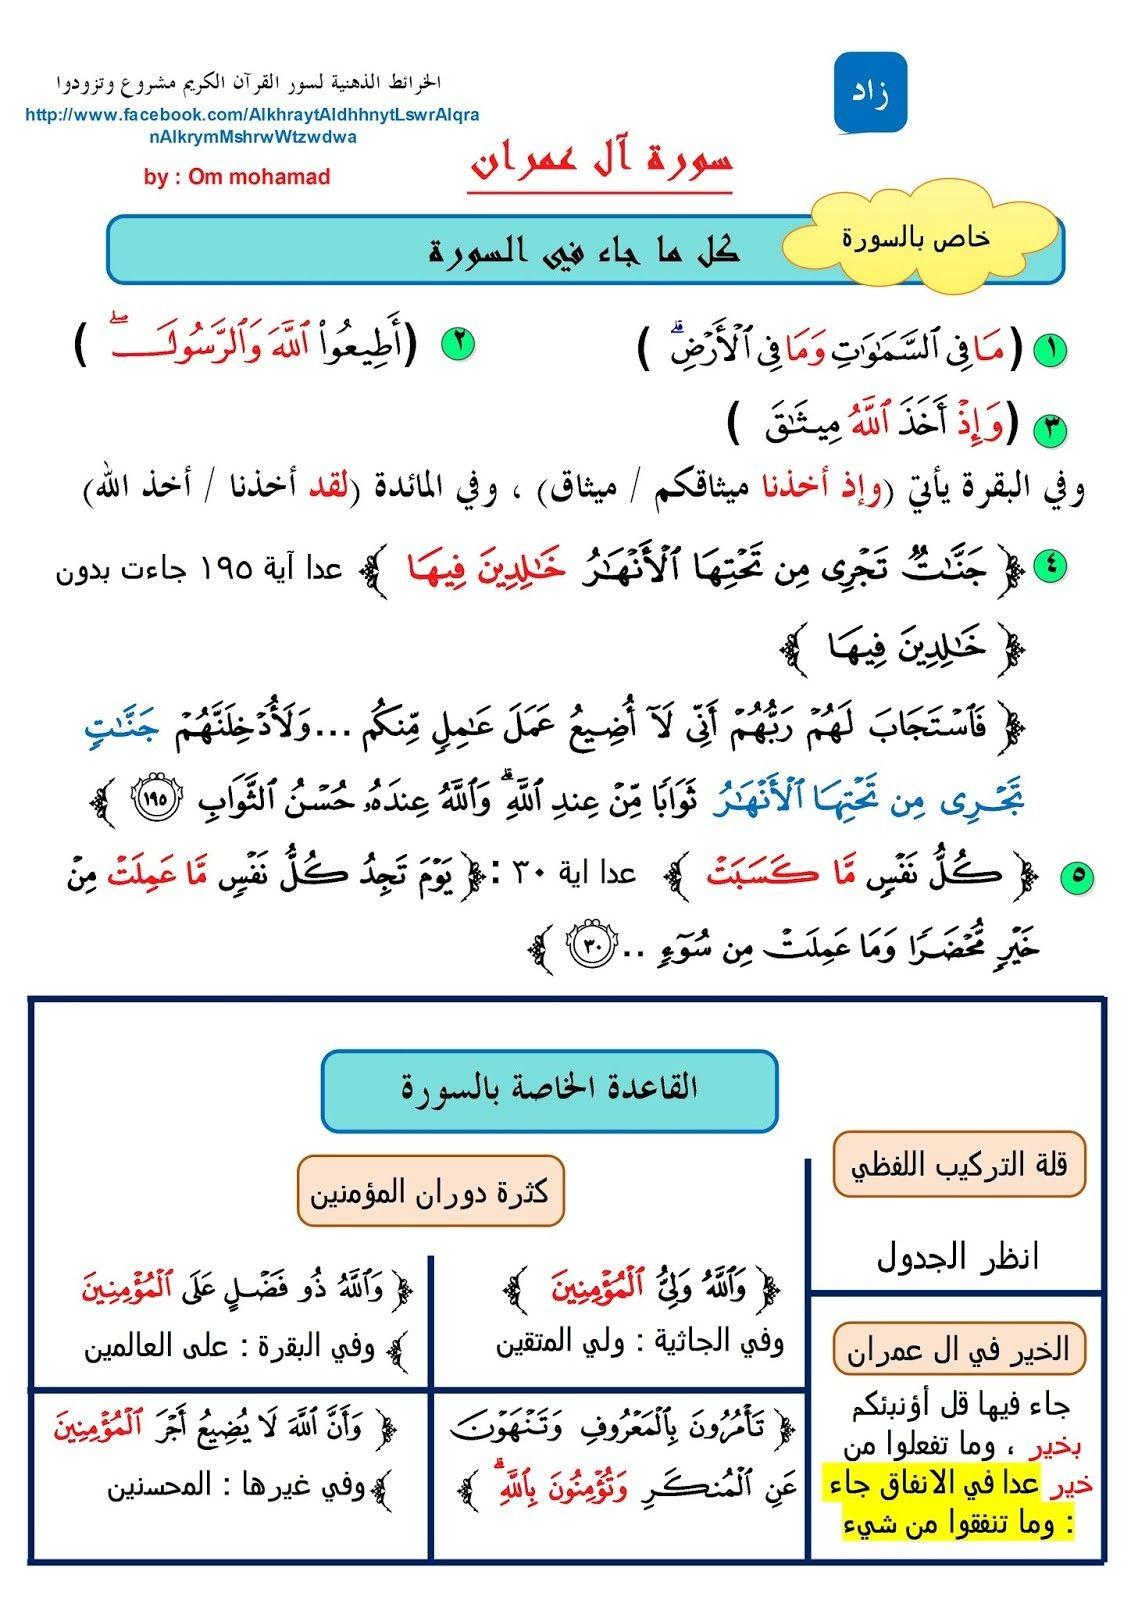 Pin By فاطمة حافظ On متشابهات القرآن الكريم Bullet Journal Journal